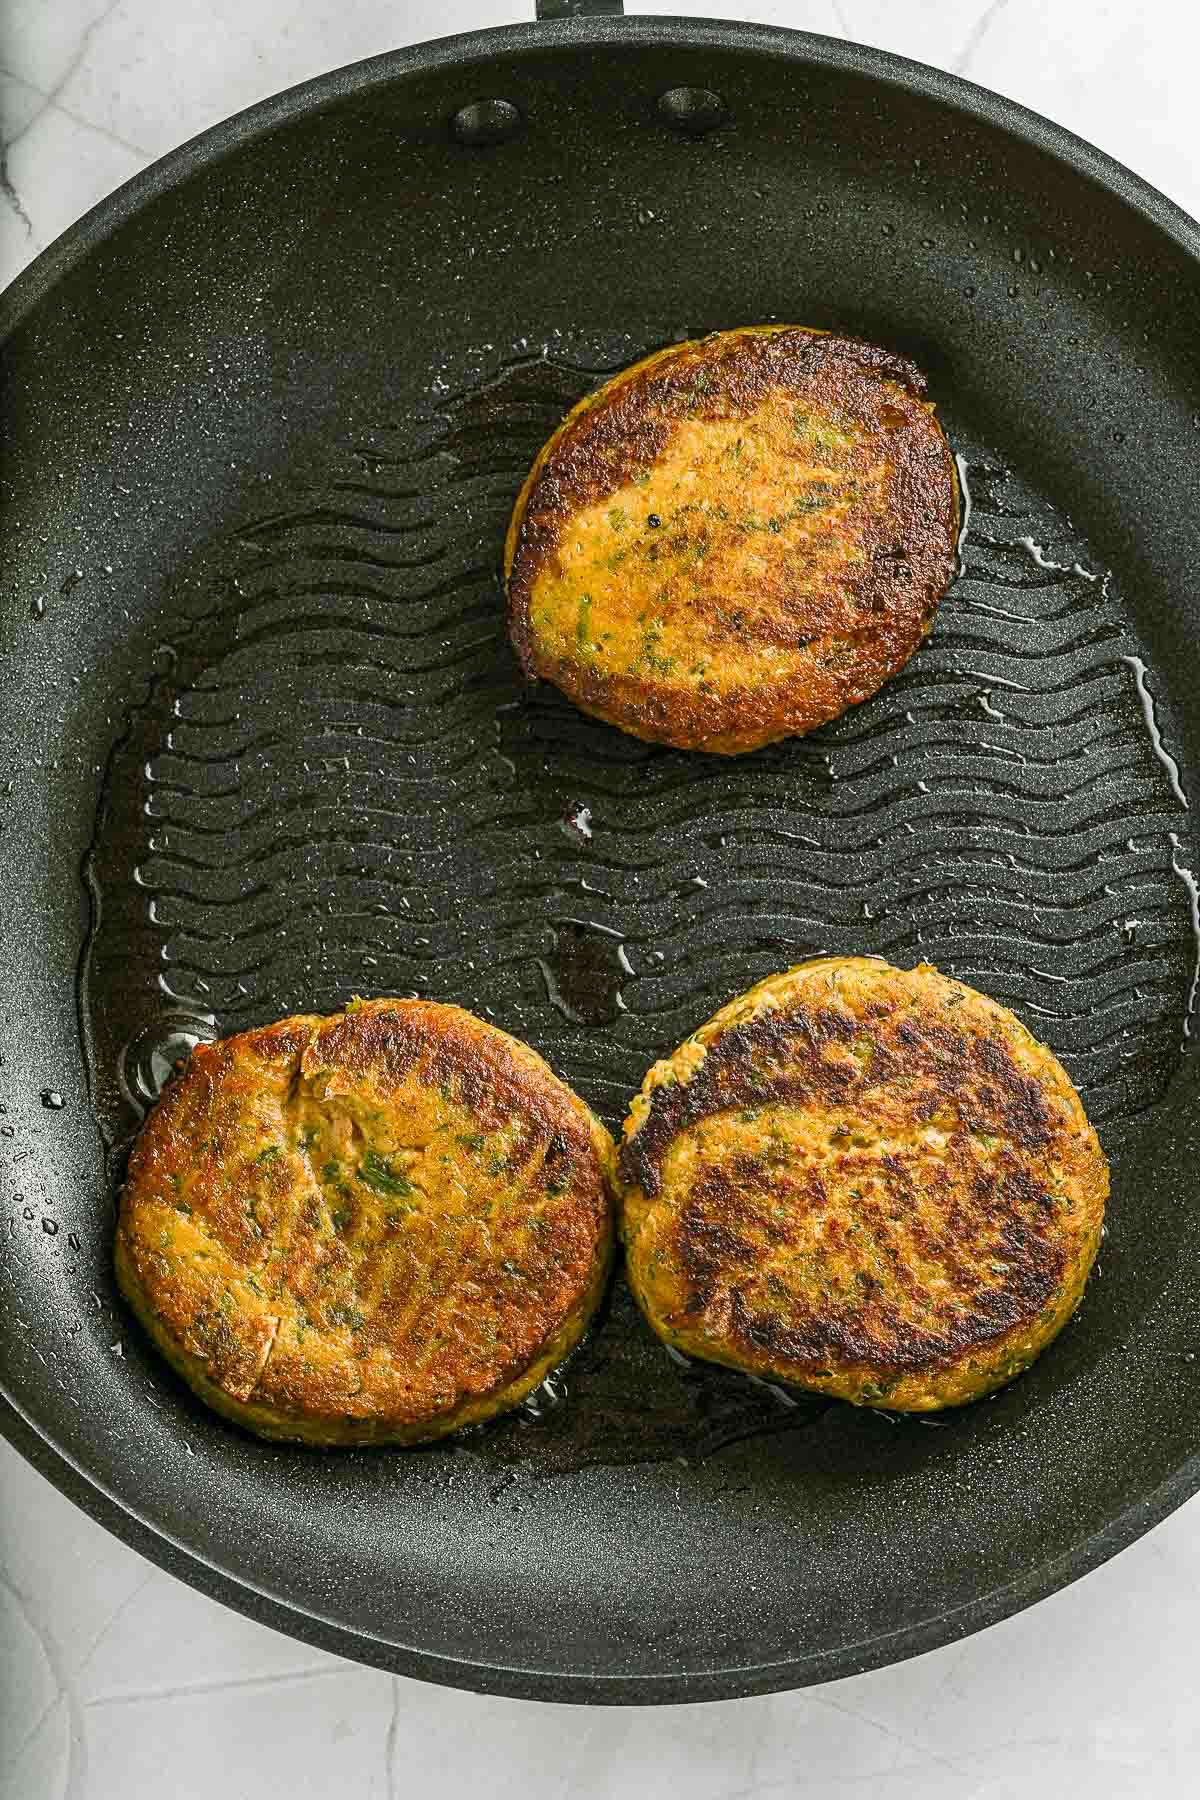 pan frying chickpea burgers